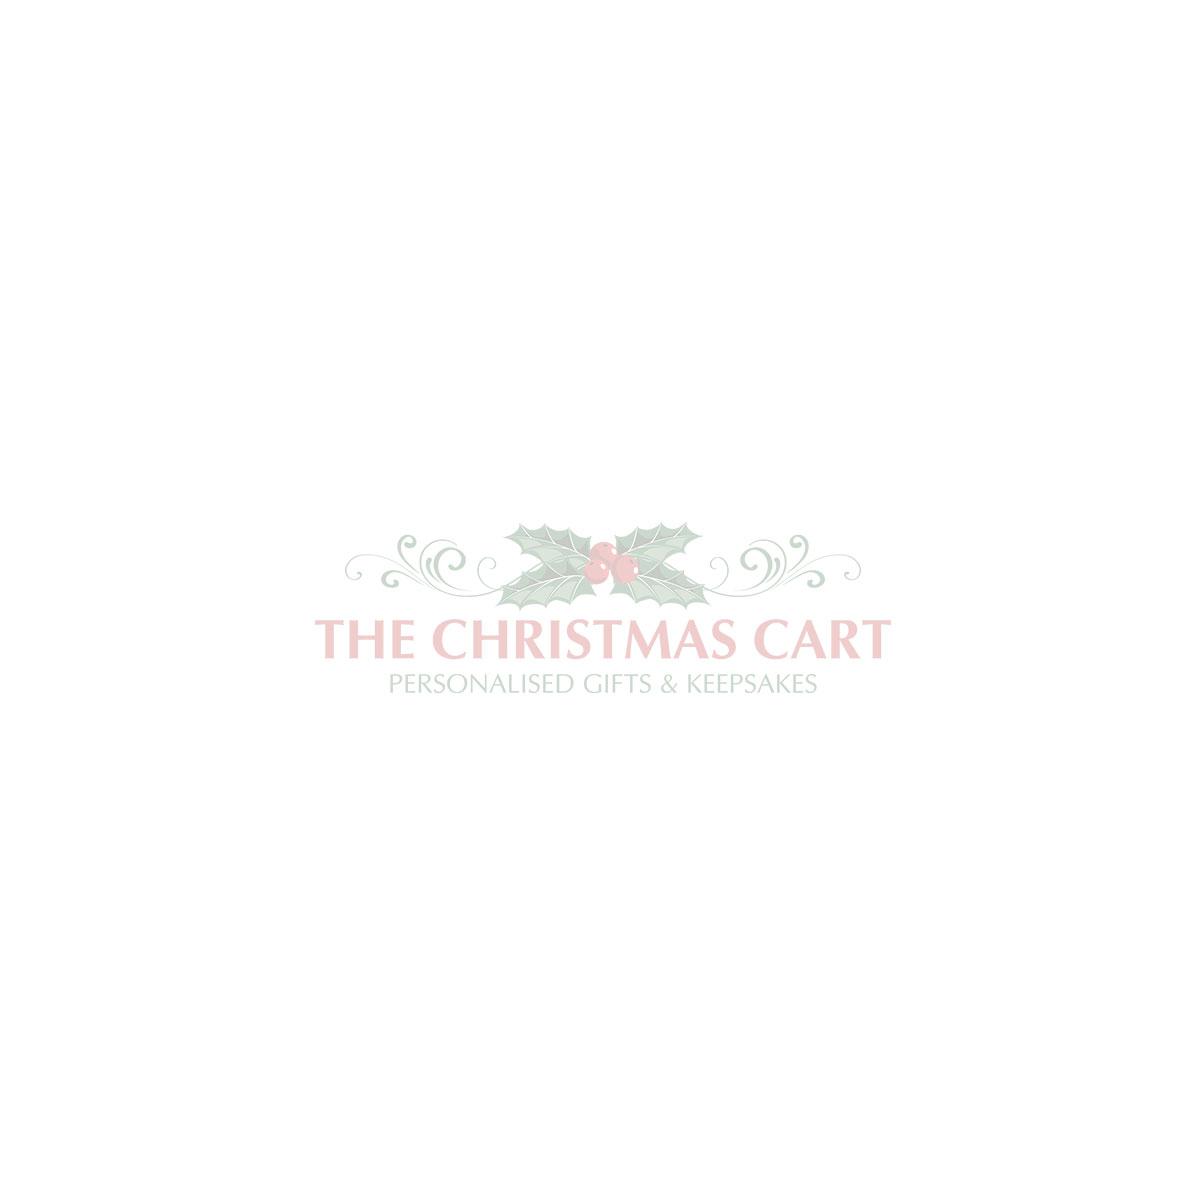 Nutcracker Merry Christmas To All Poster Print